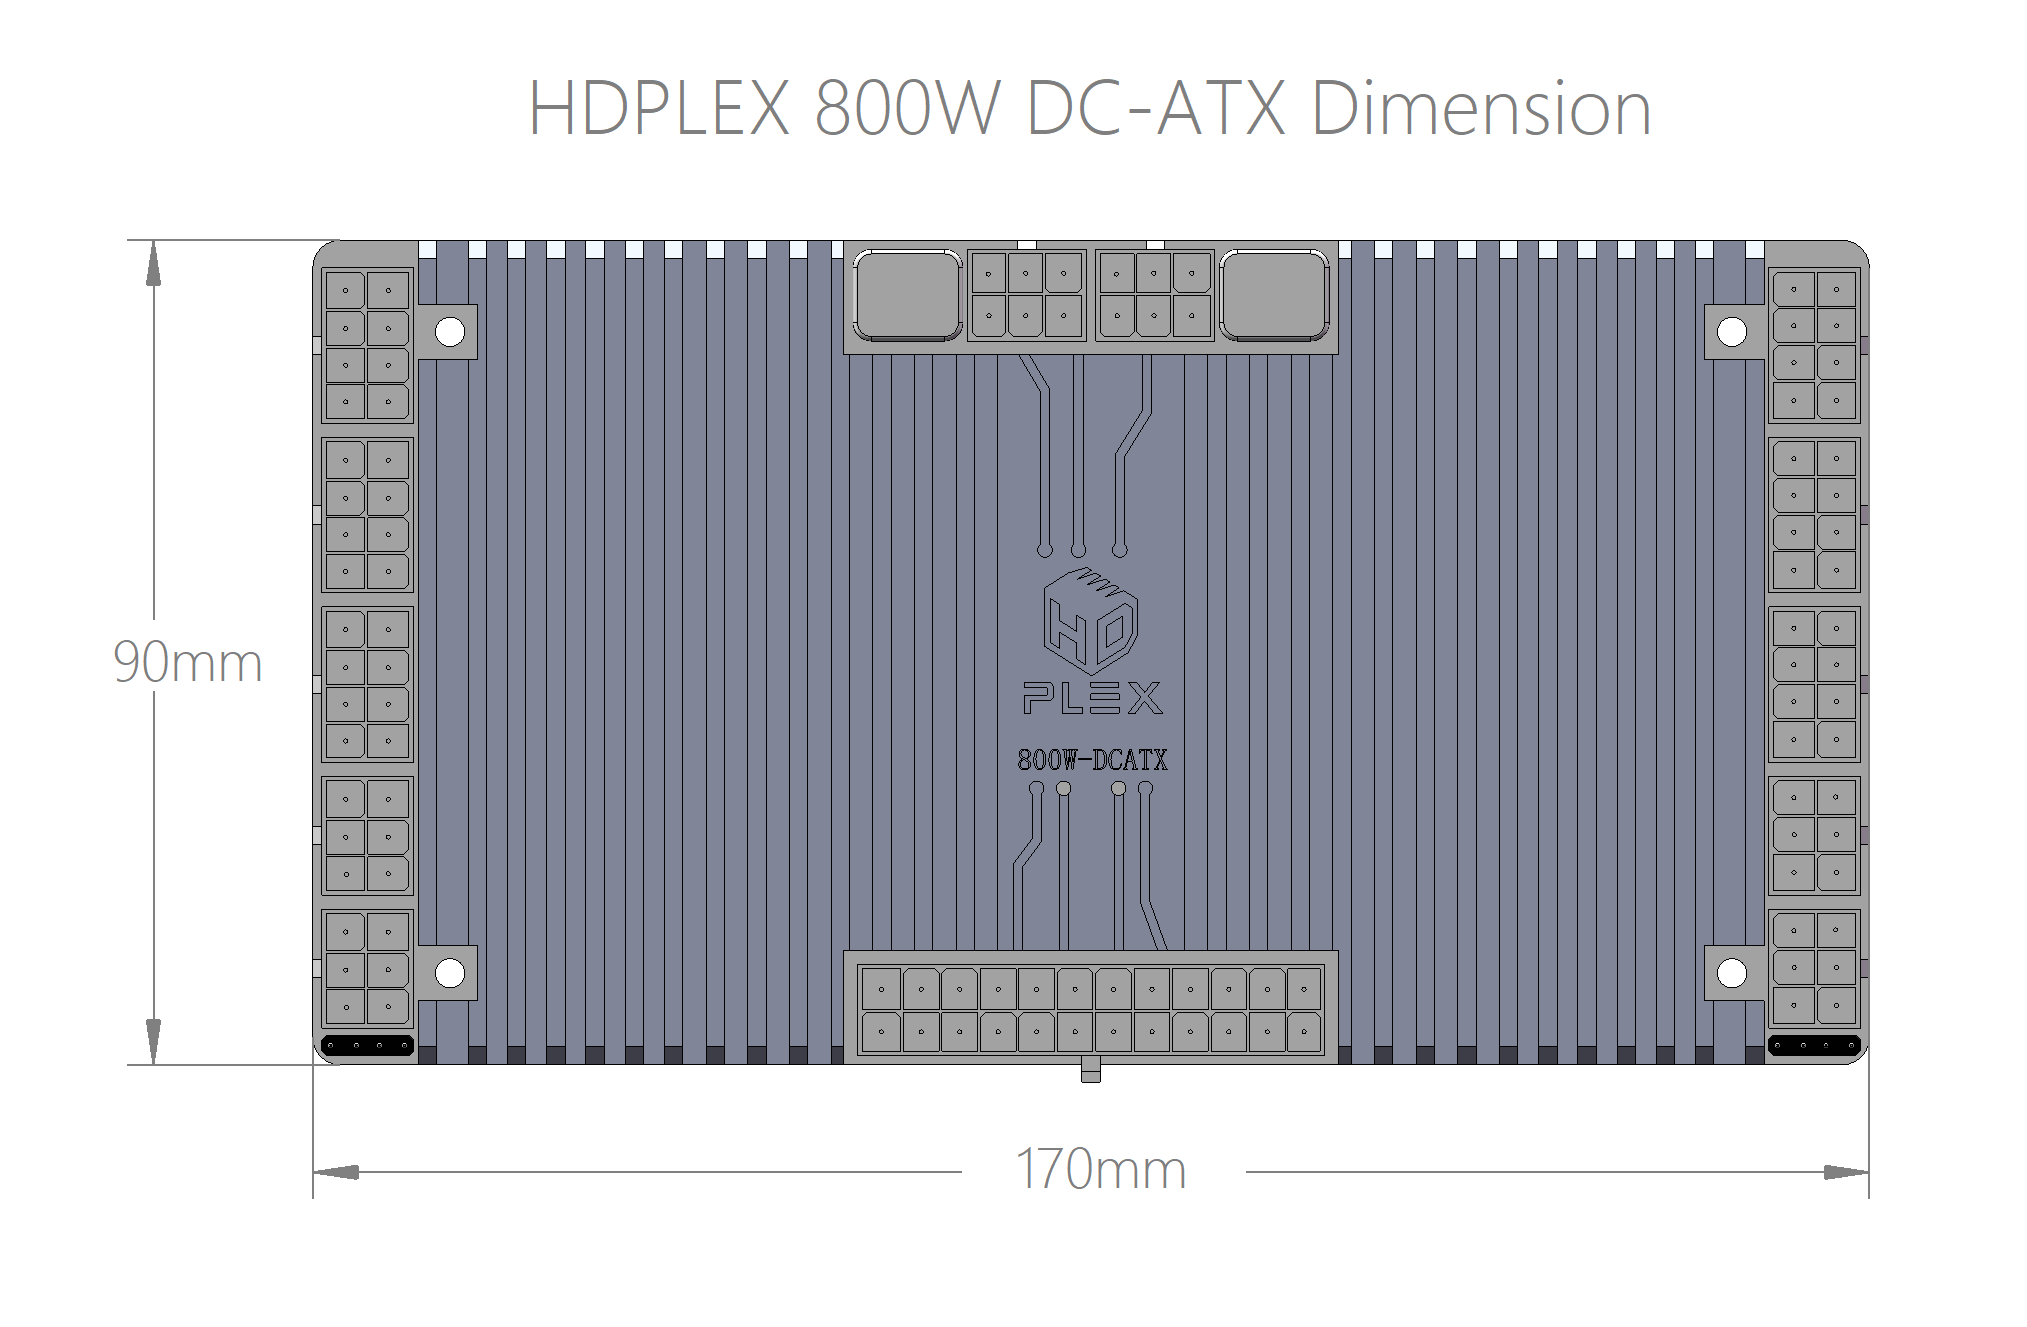 HDPLEX 800W DC-ATX Converter Dimension